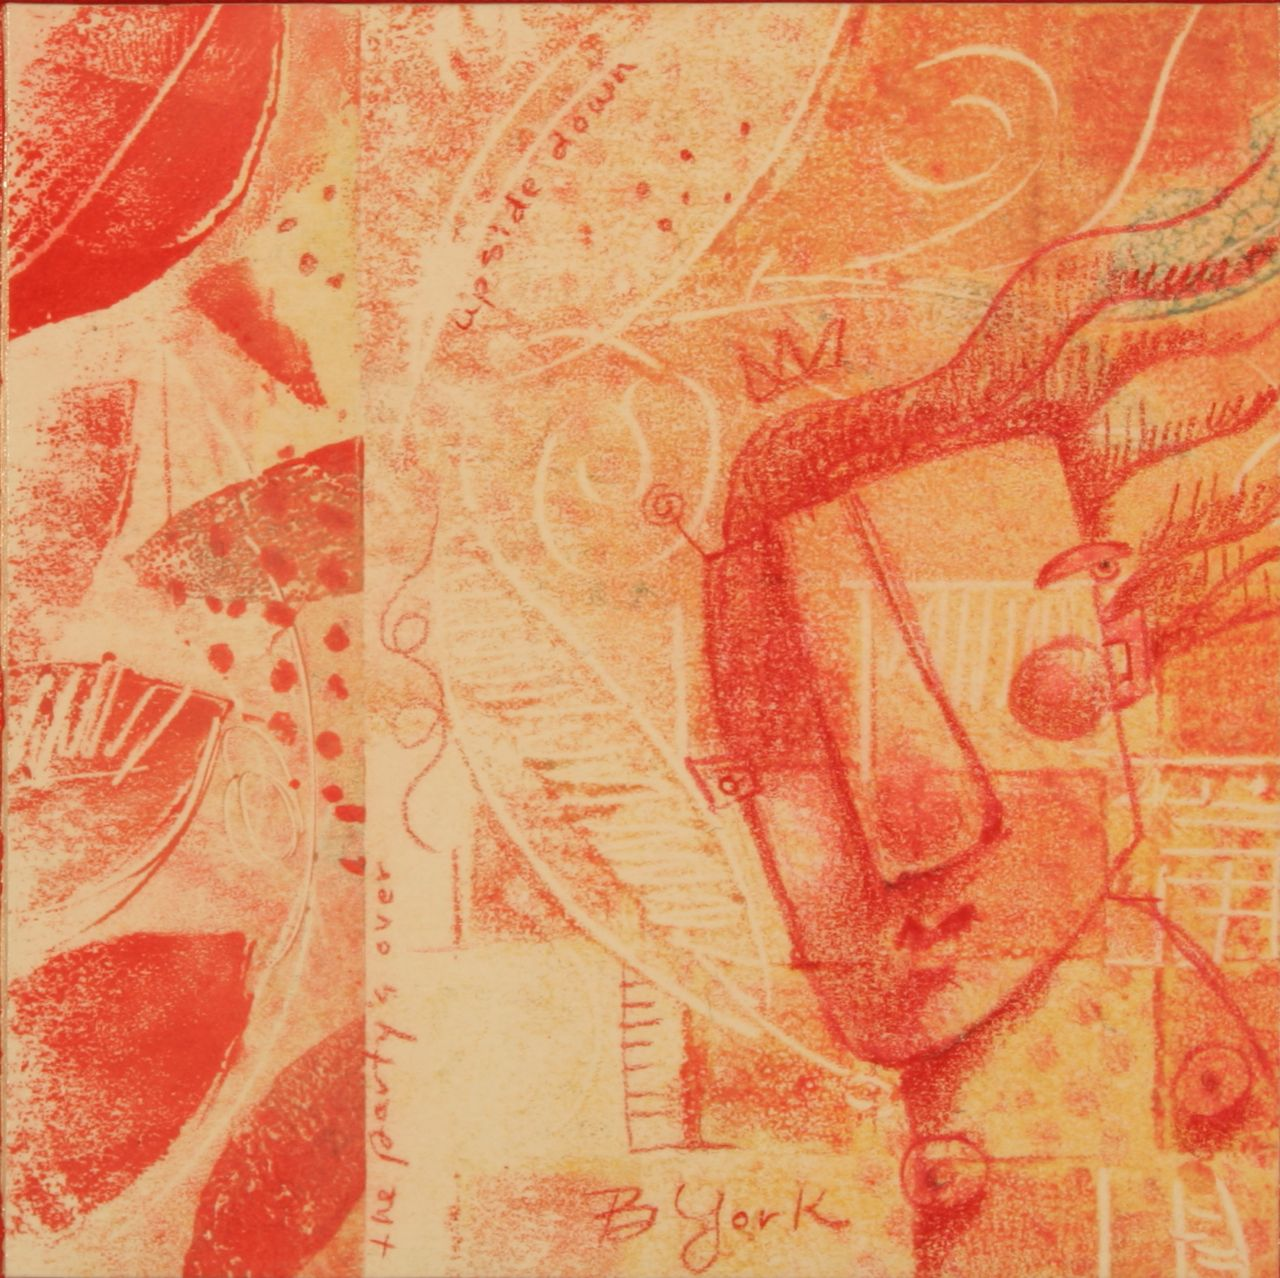 """Soft Spot, Out Of The Vault"" original fine art by Brenda York"